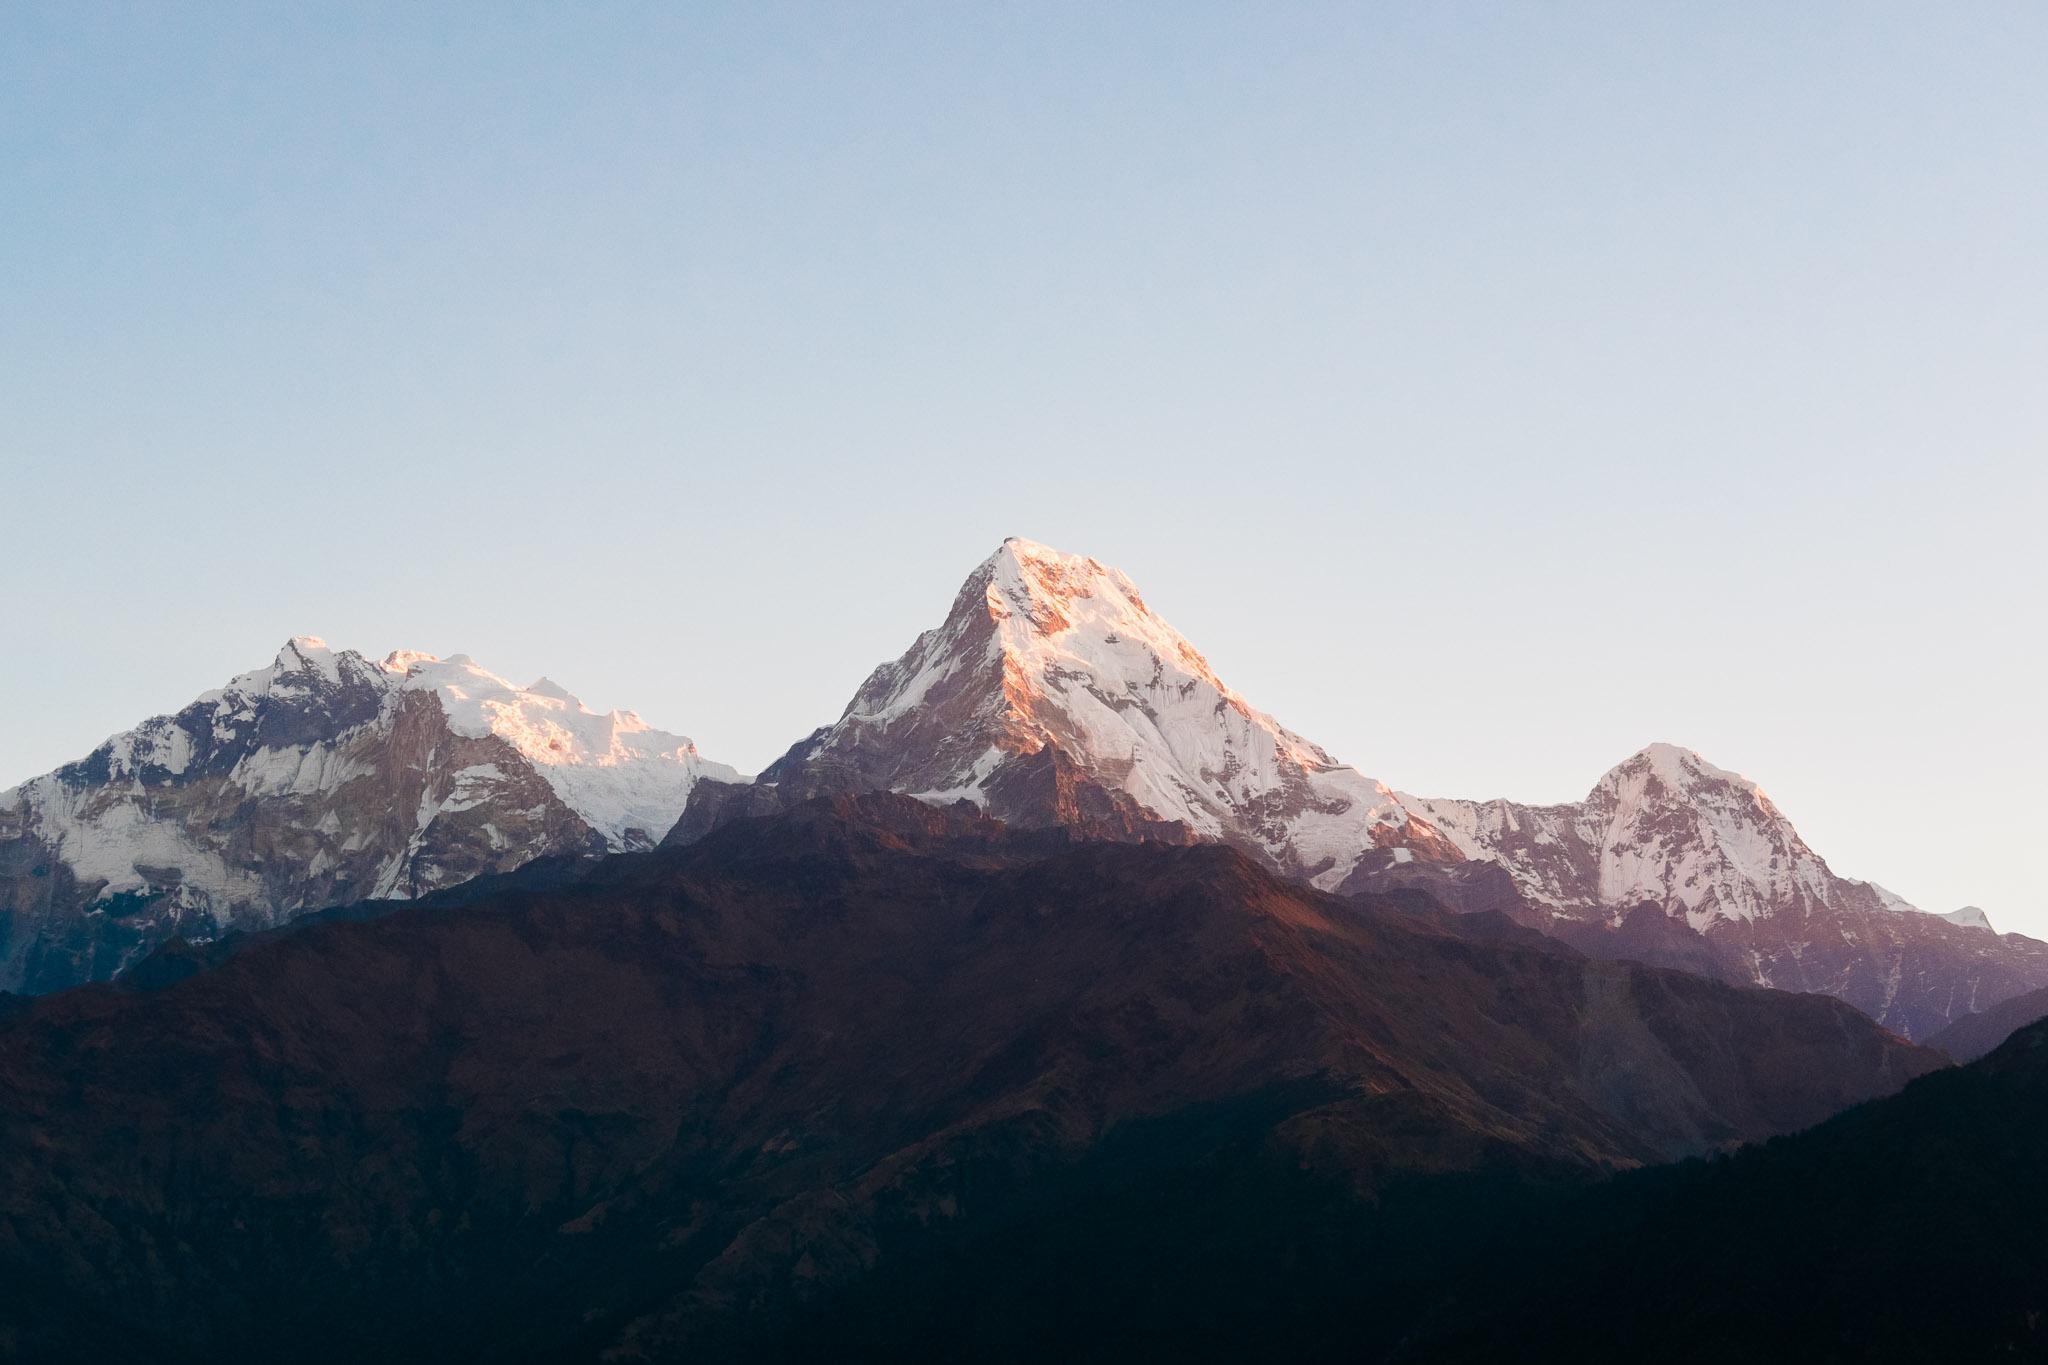 nepal-pokhara-ghorepani-poon-hill-mountain-teahouse-trek-14.jpg